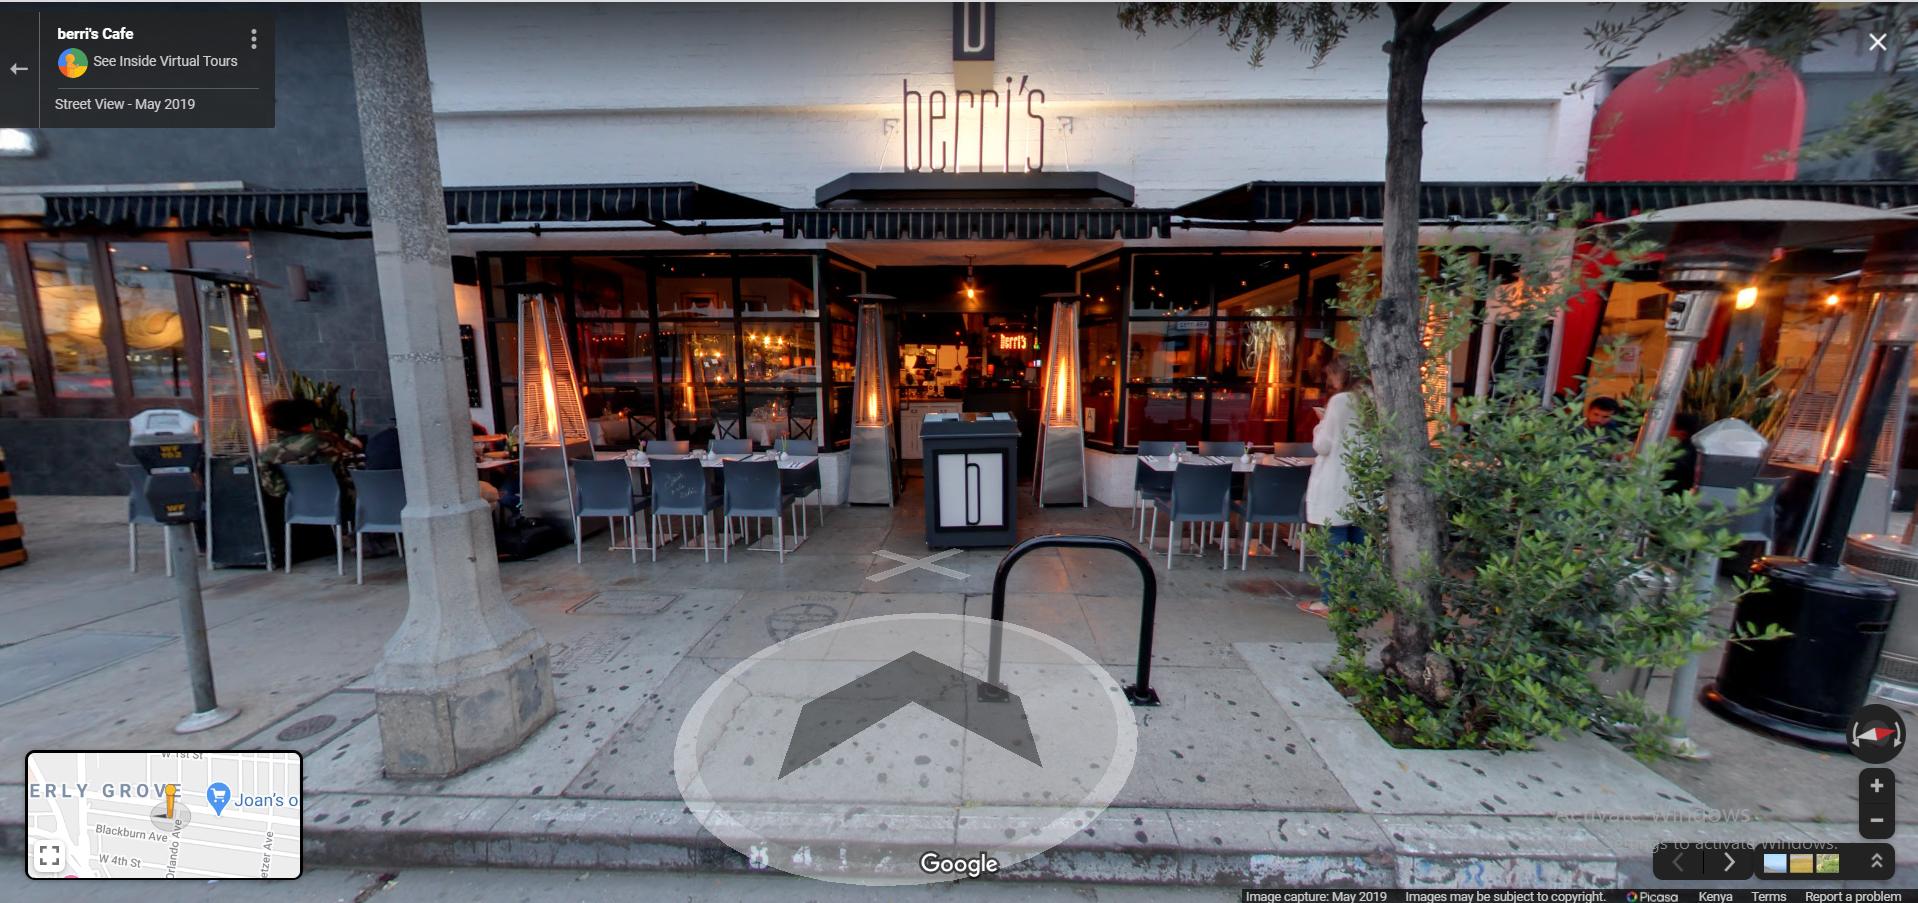 berri's pizza, Berri's Cafe - Los Angeles